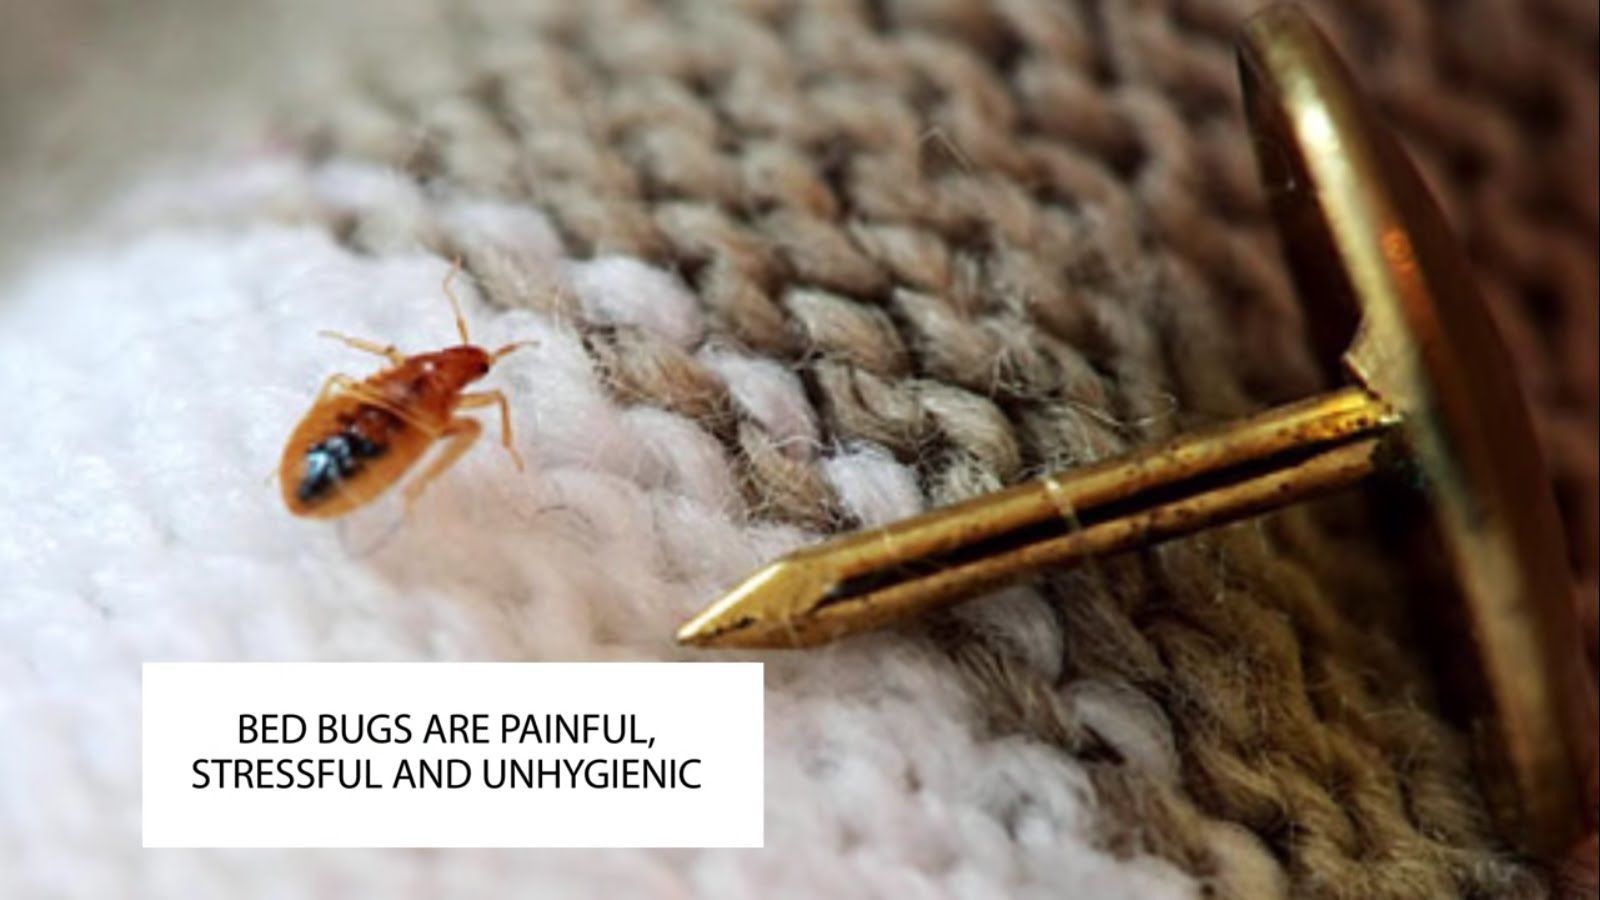 http//www.pestcontrol4london.co.uk/bedbugspestcontrol